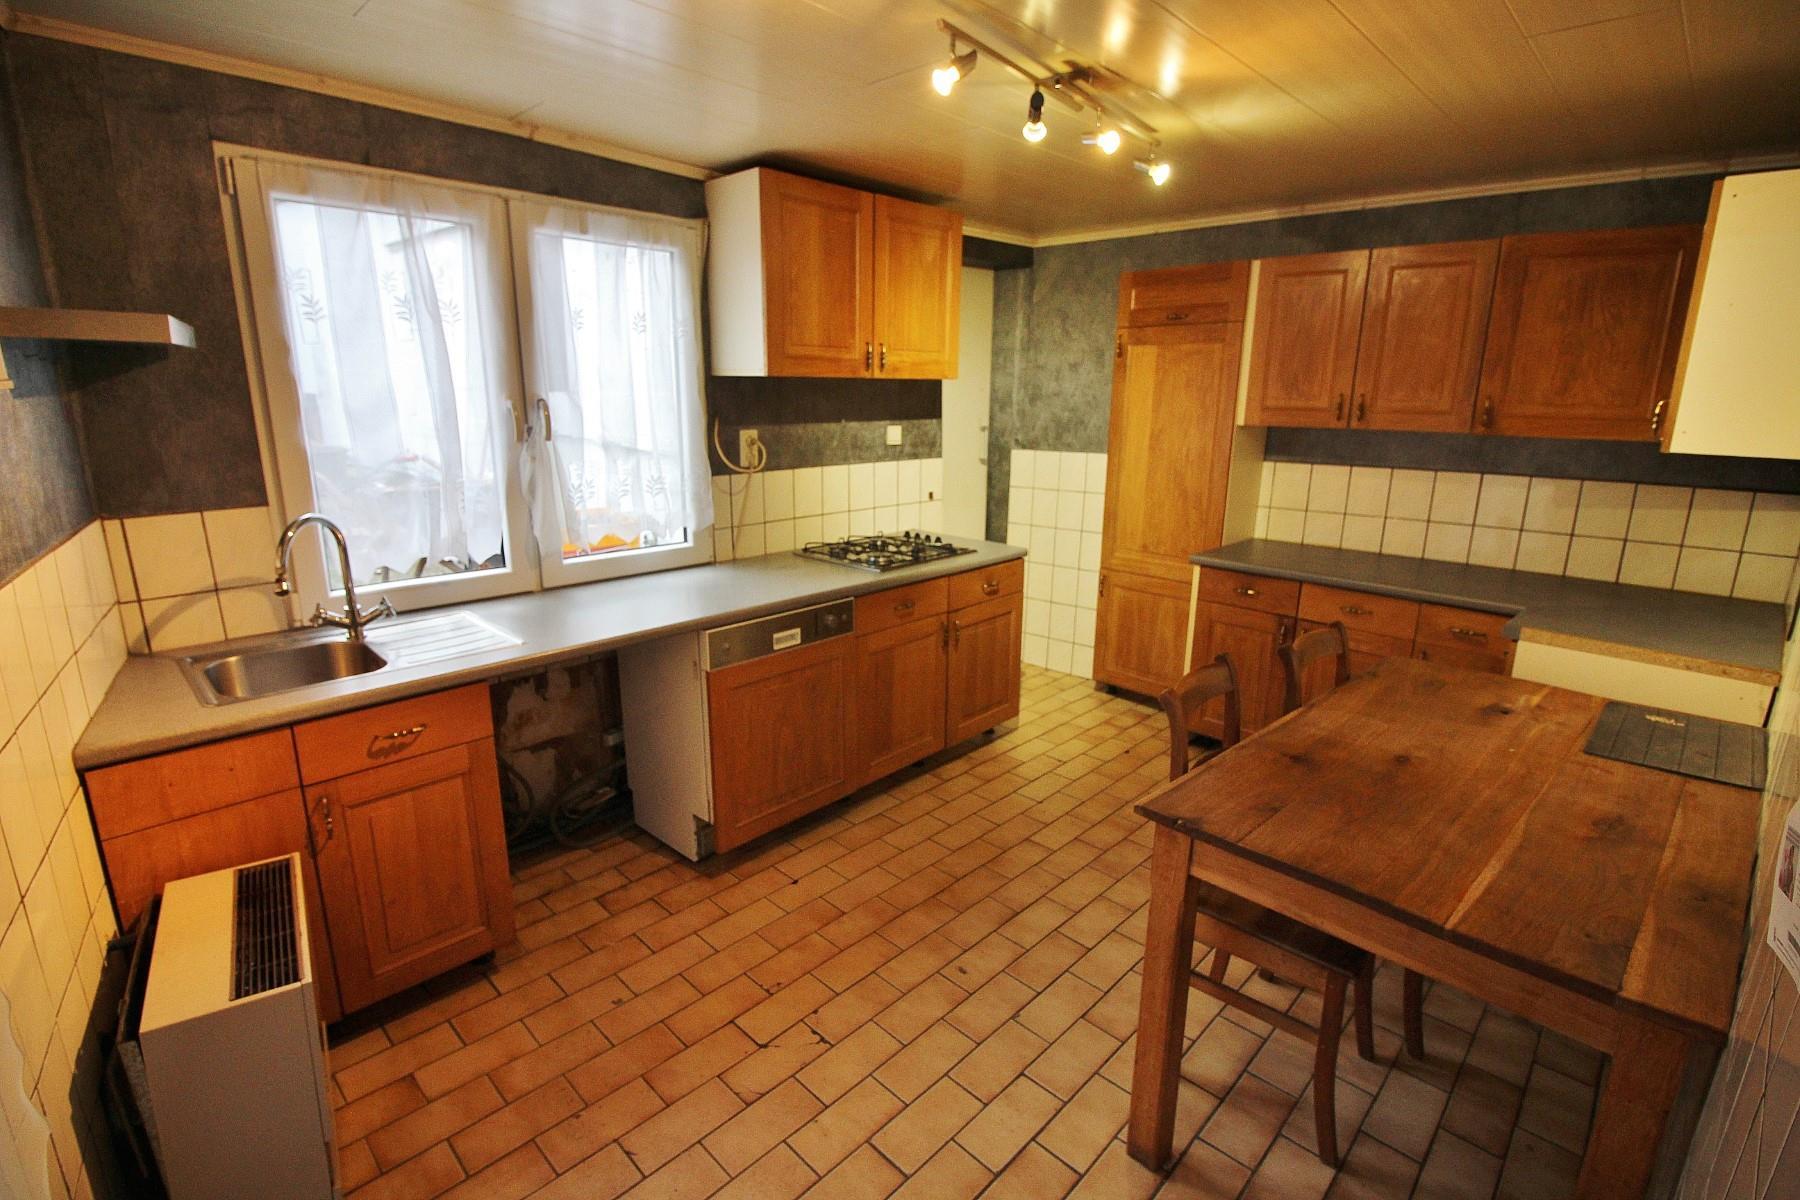 Maison - Beyne-Heusay Bellaire - #3946189-4